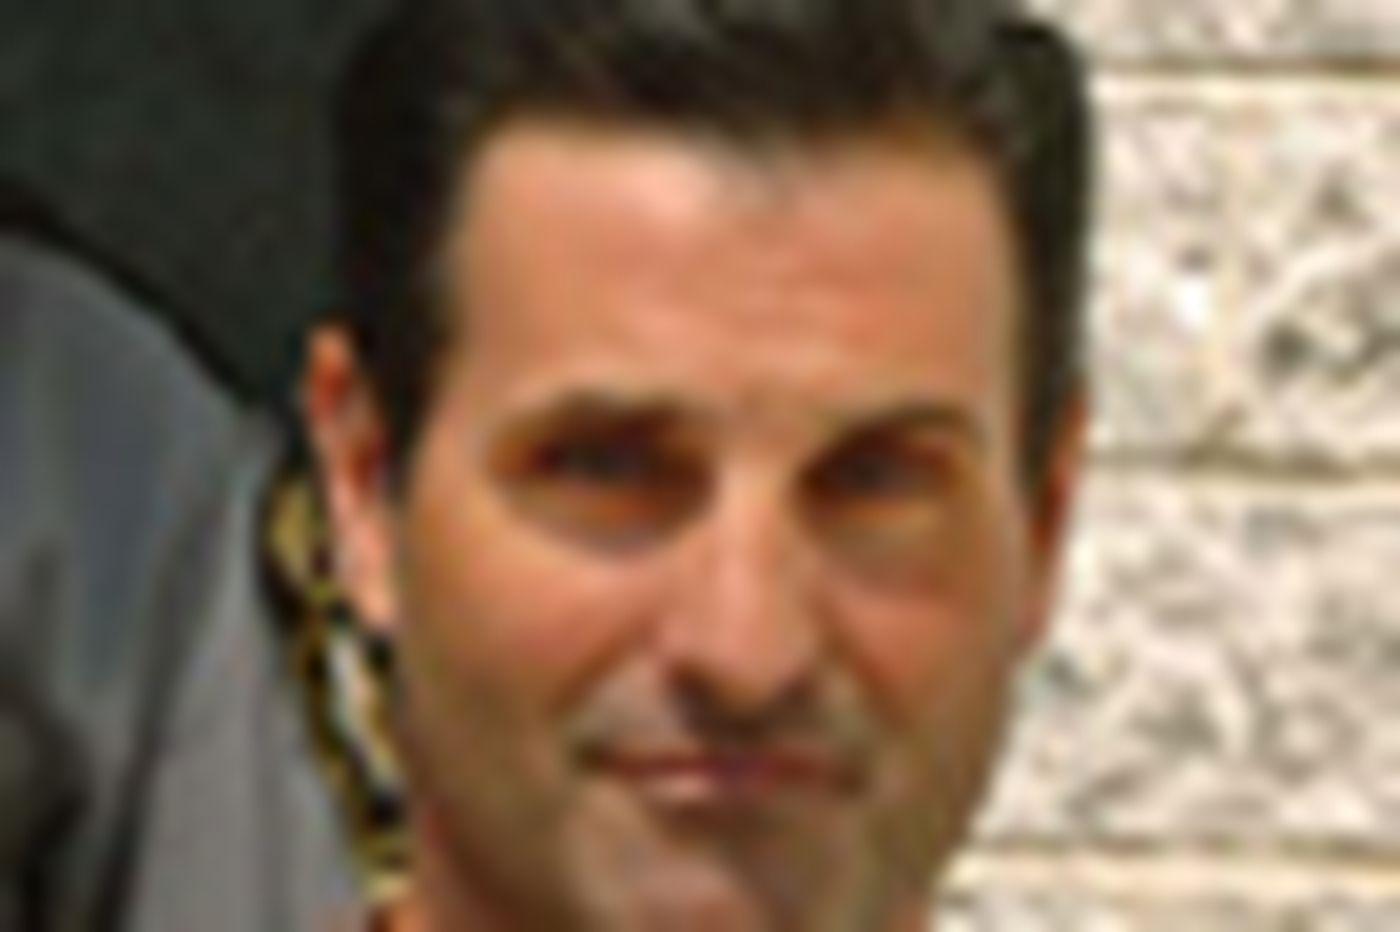 Monacello turns witness in Ligambi case